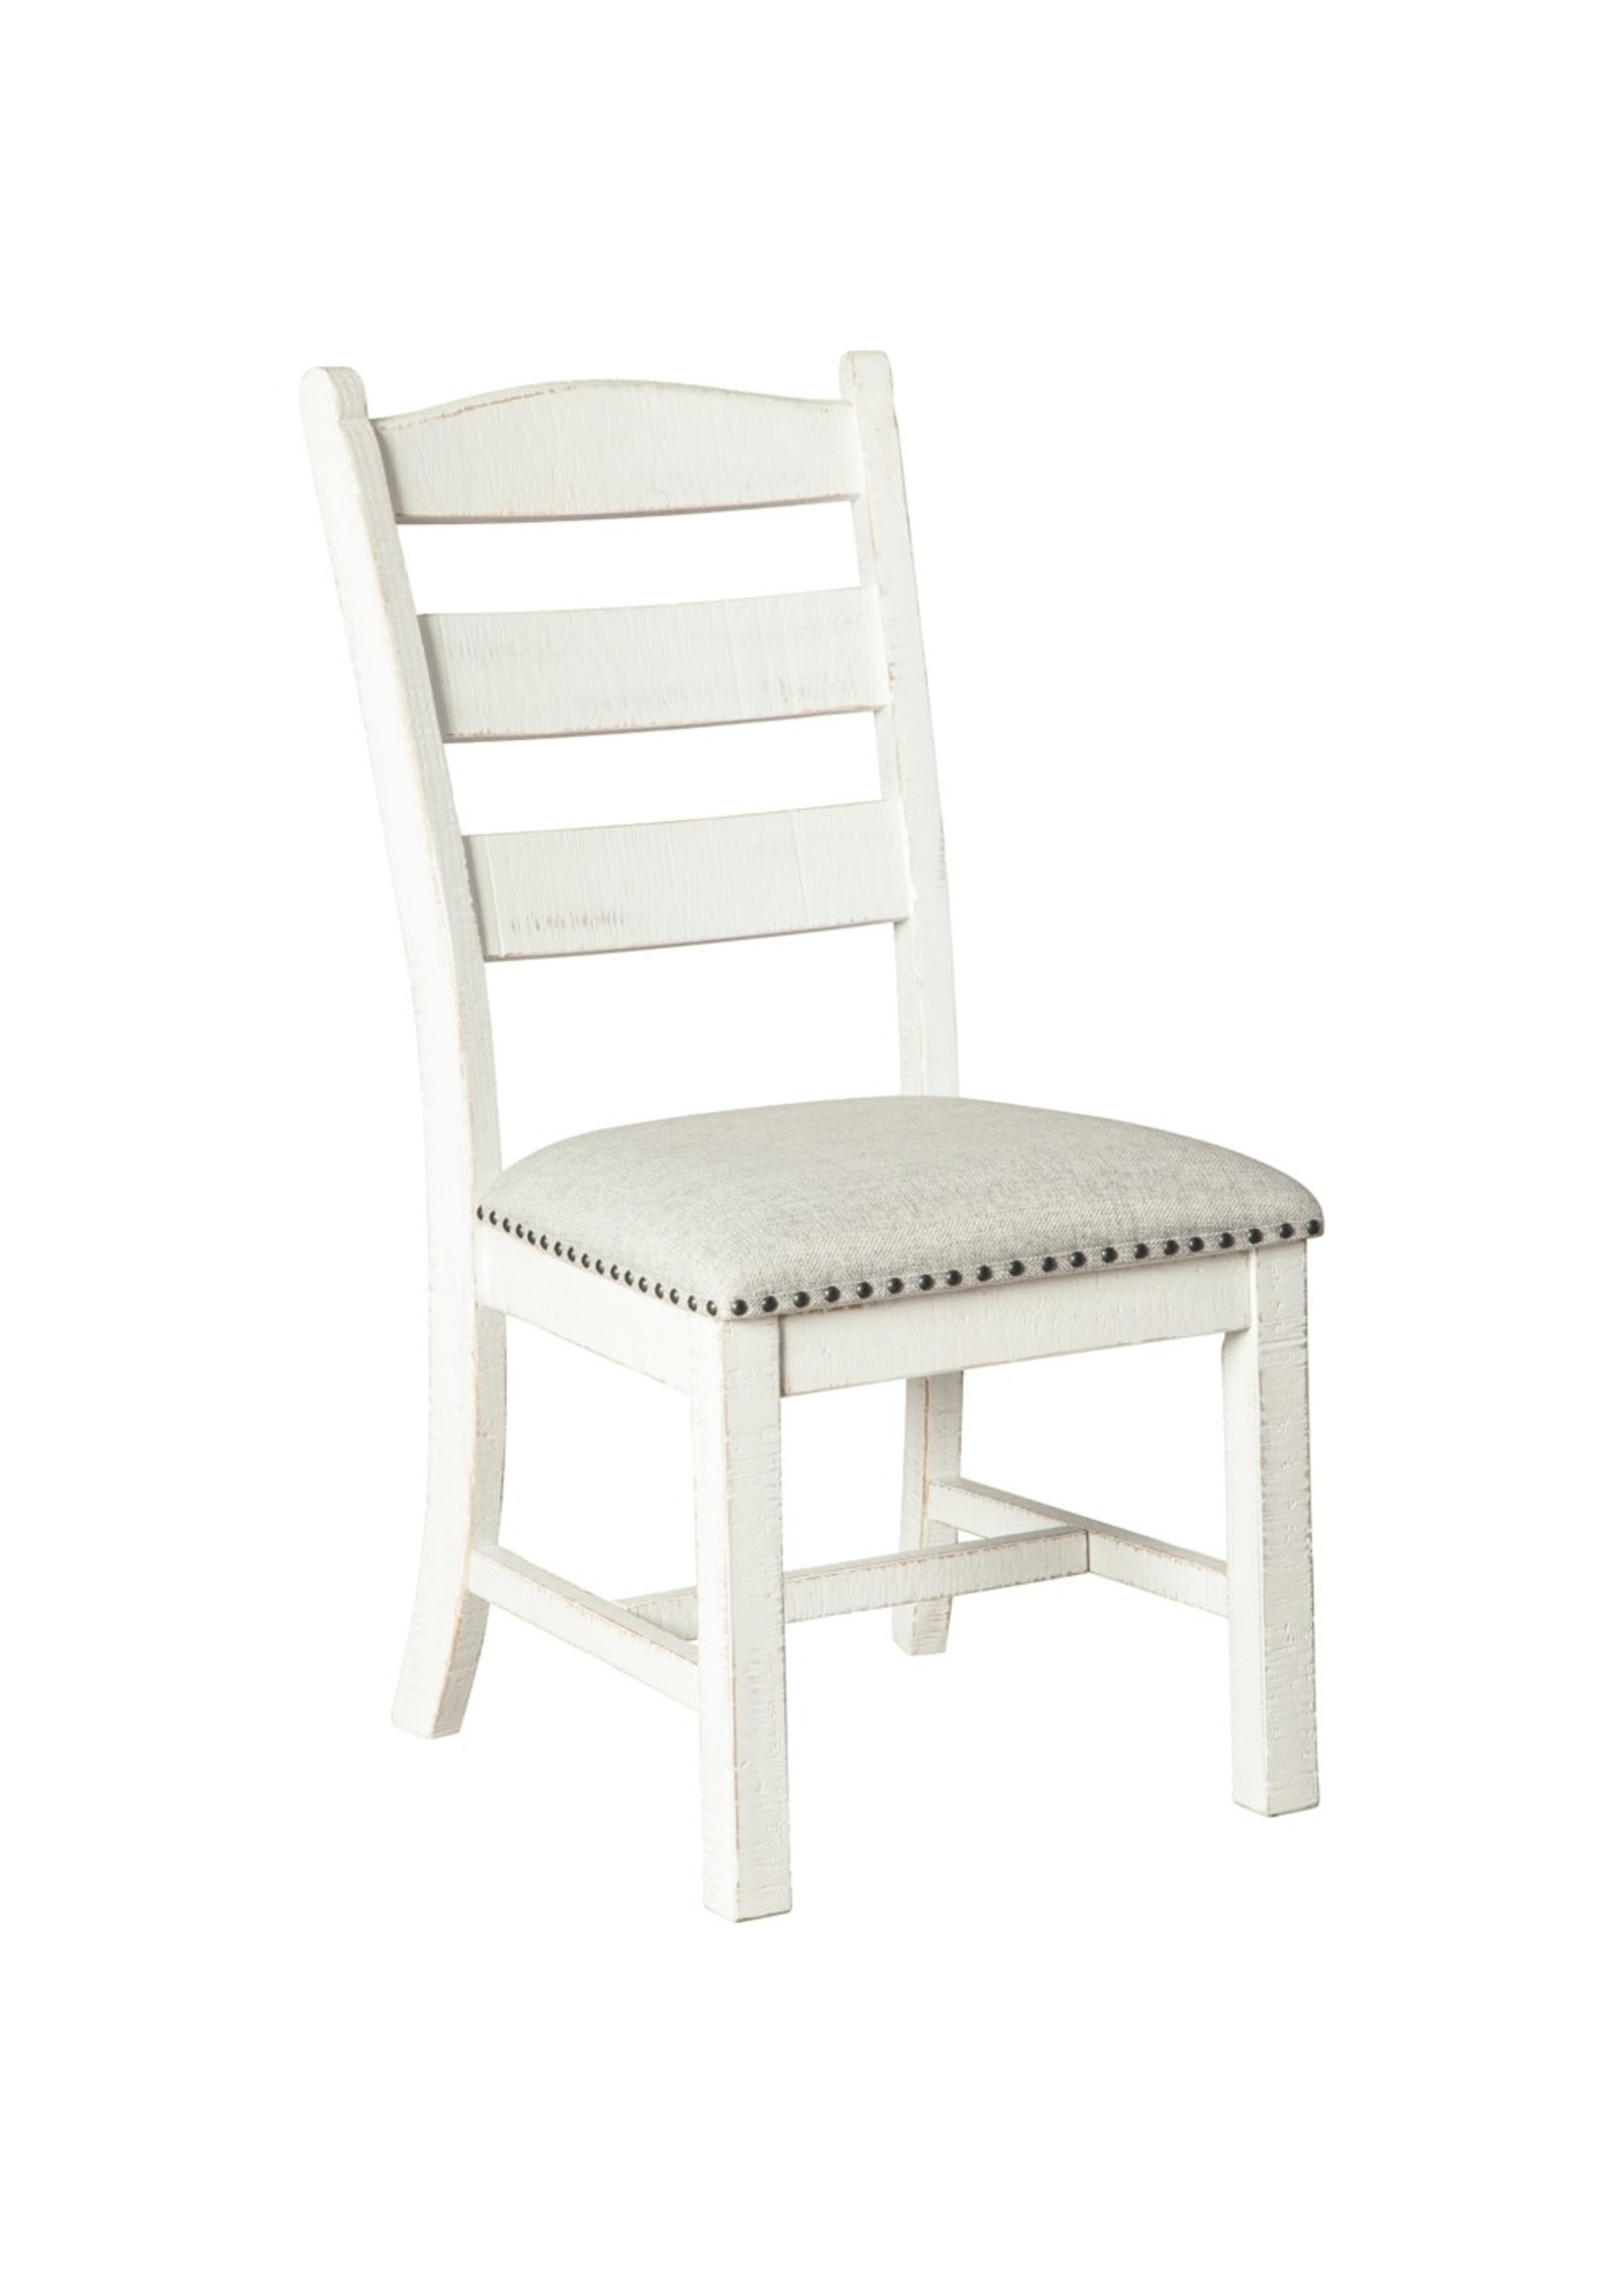 ASHLEY D546-01 DINING CHAIR VALEBECK BEIGE/WHITE